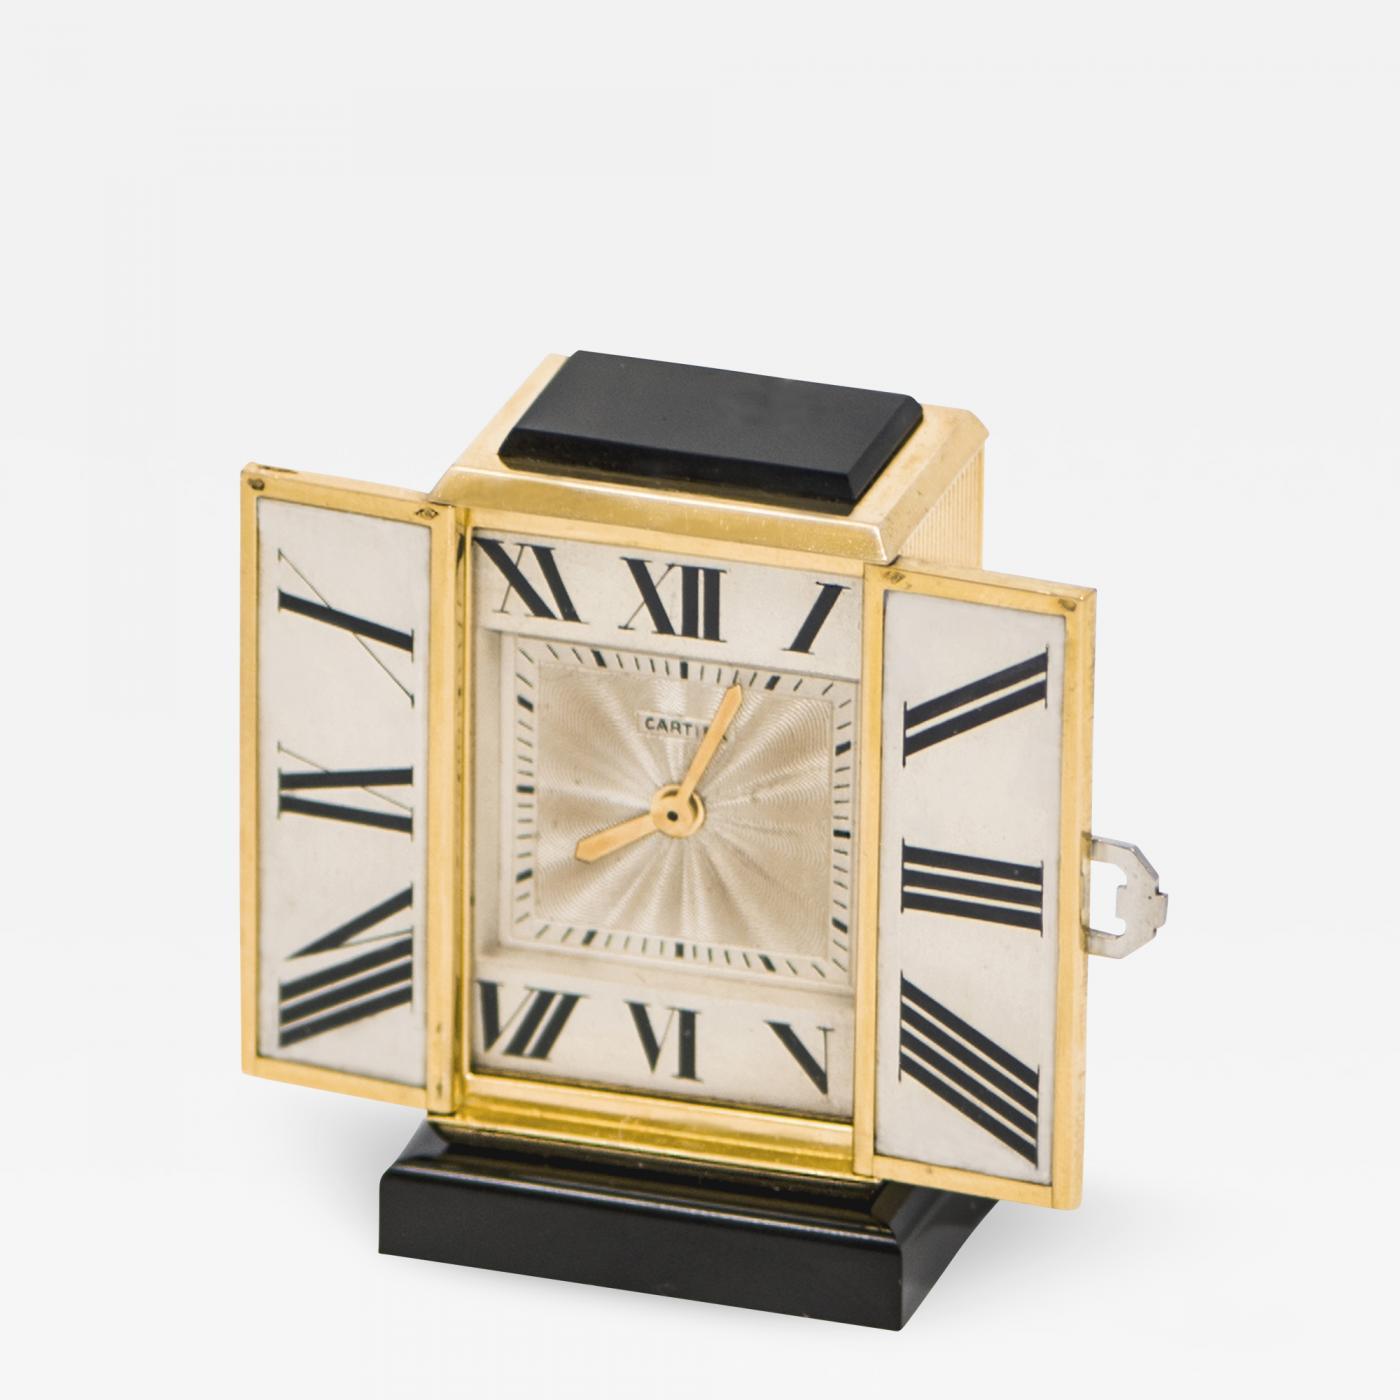 Cartier Iconic 1920s Art Deco Gold Onyx Platinum Diamond Enamel Shutter Clock